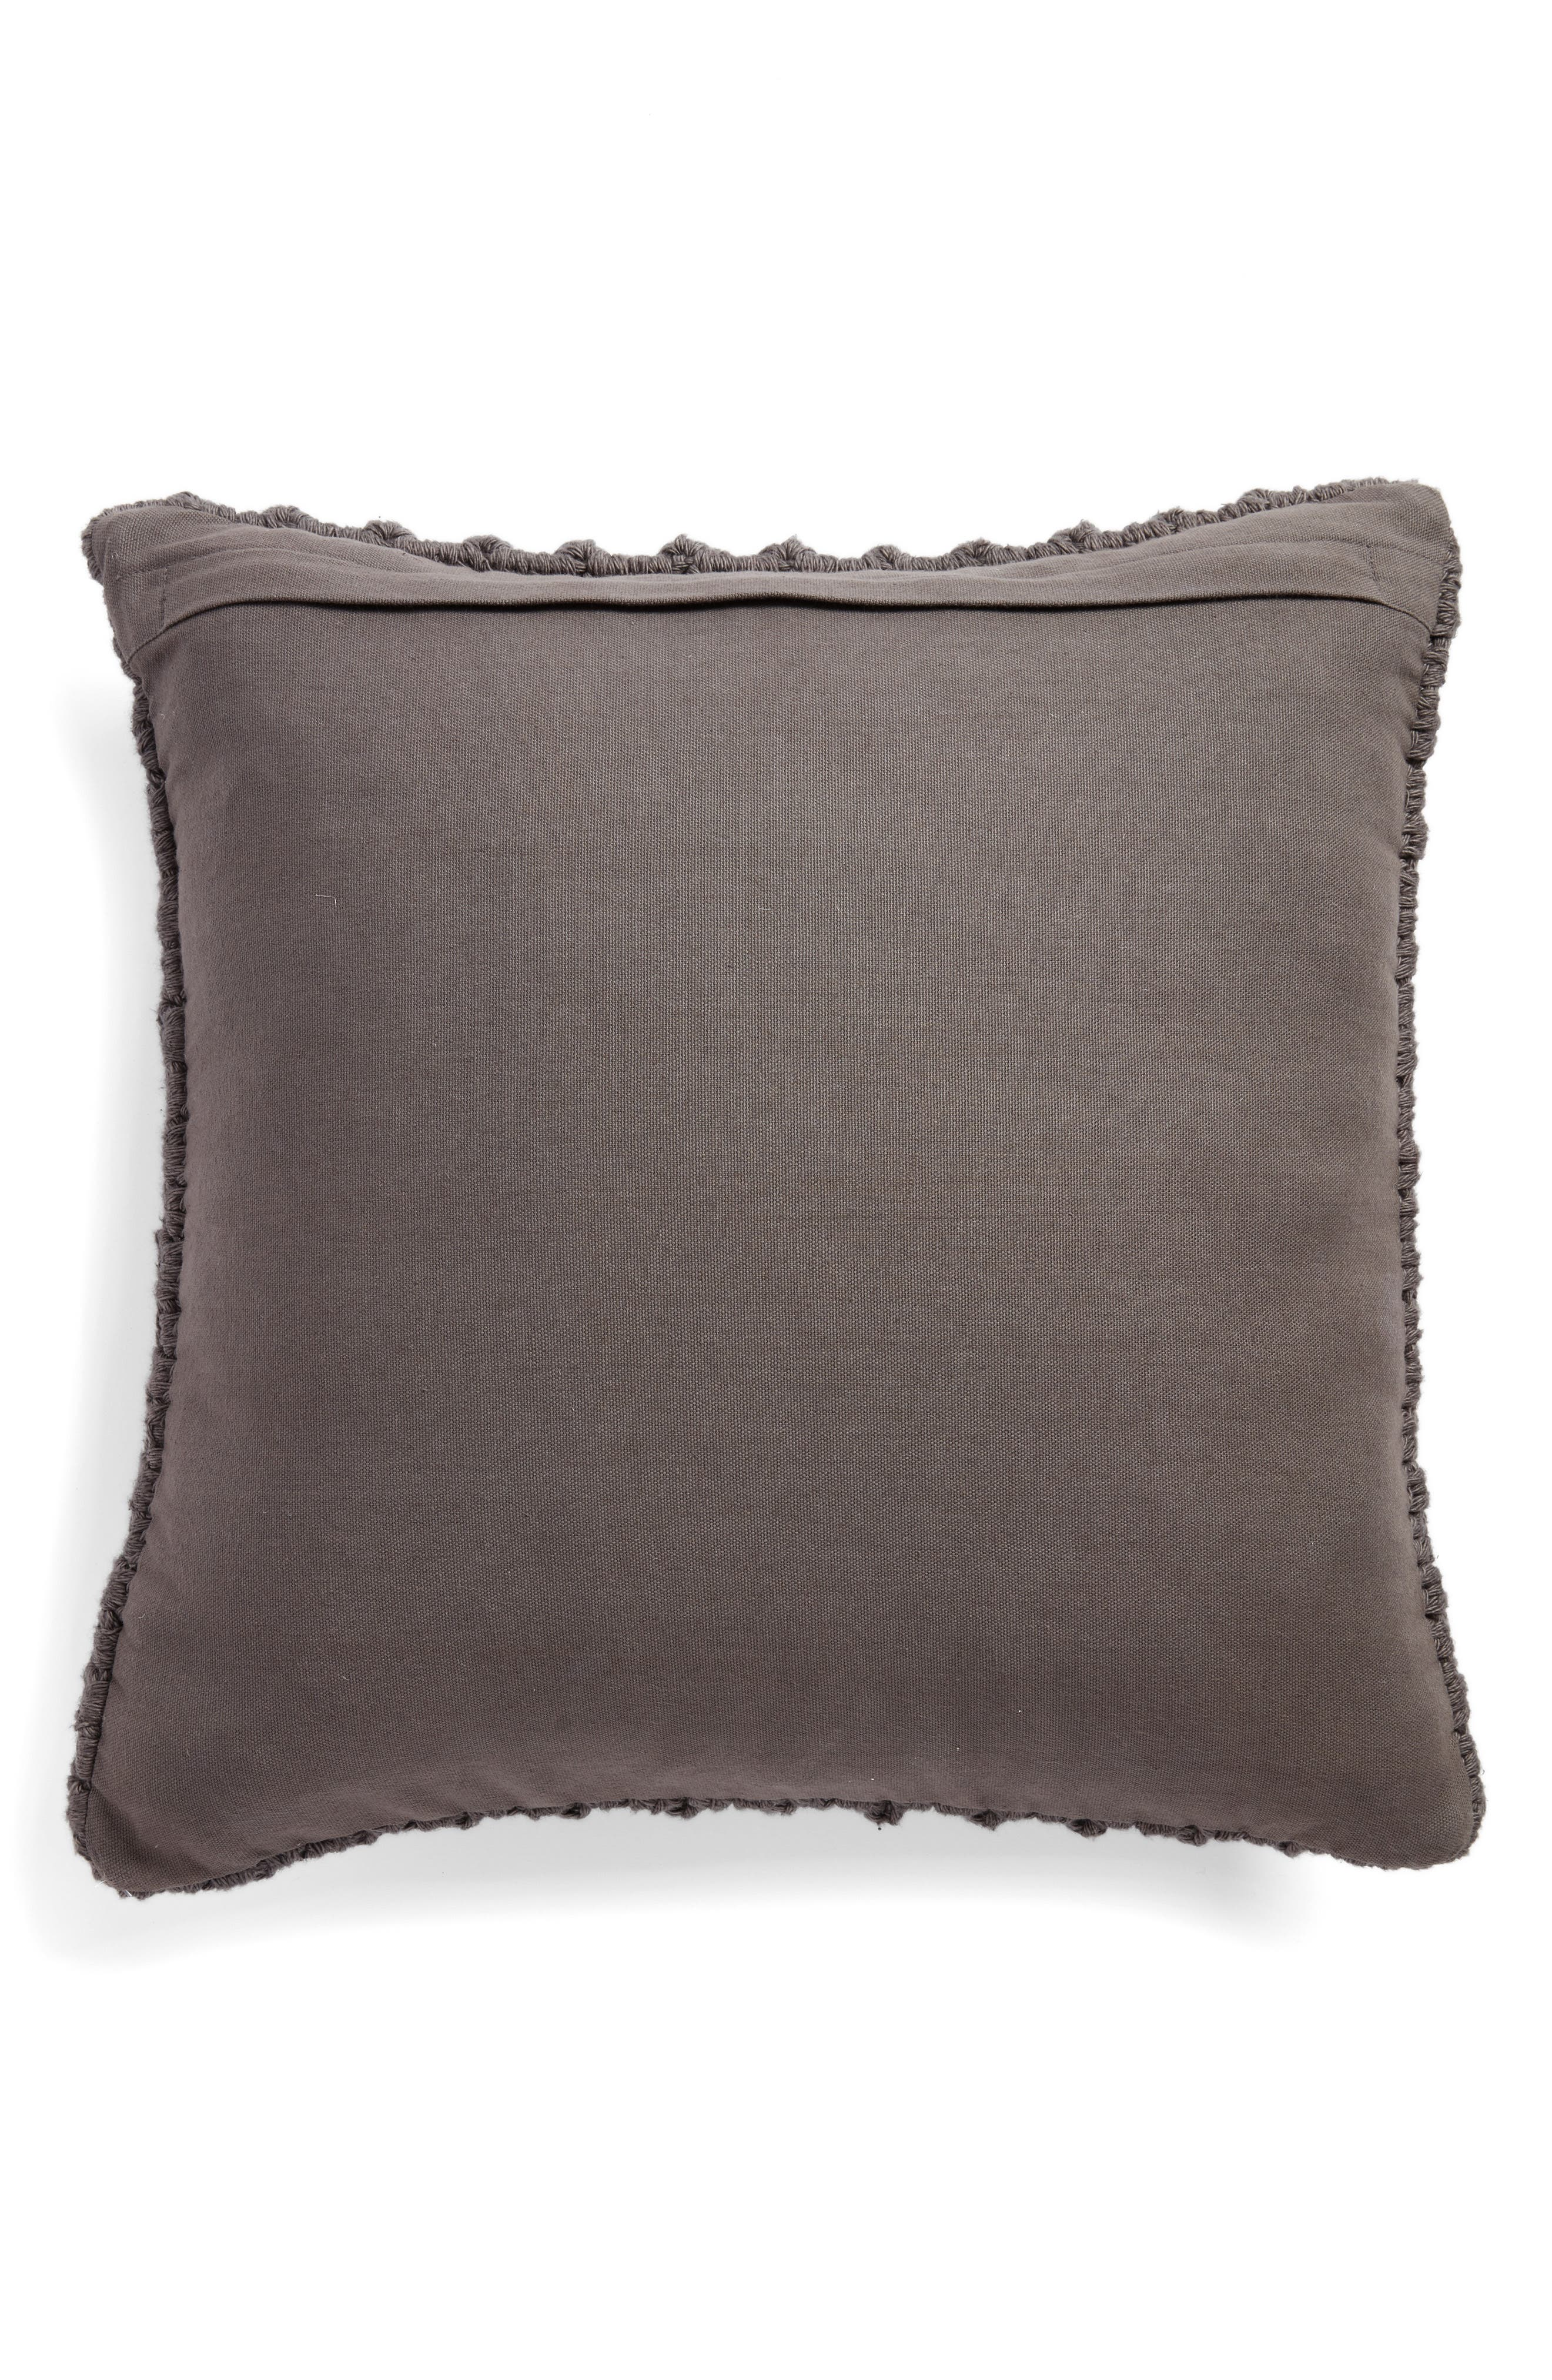 Pebble Knit Accent Pillow,                             Alternate thumbnail 2, color,                             GREY ONYX